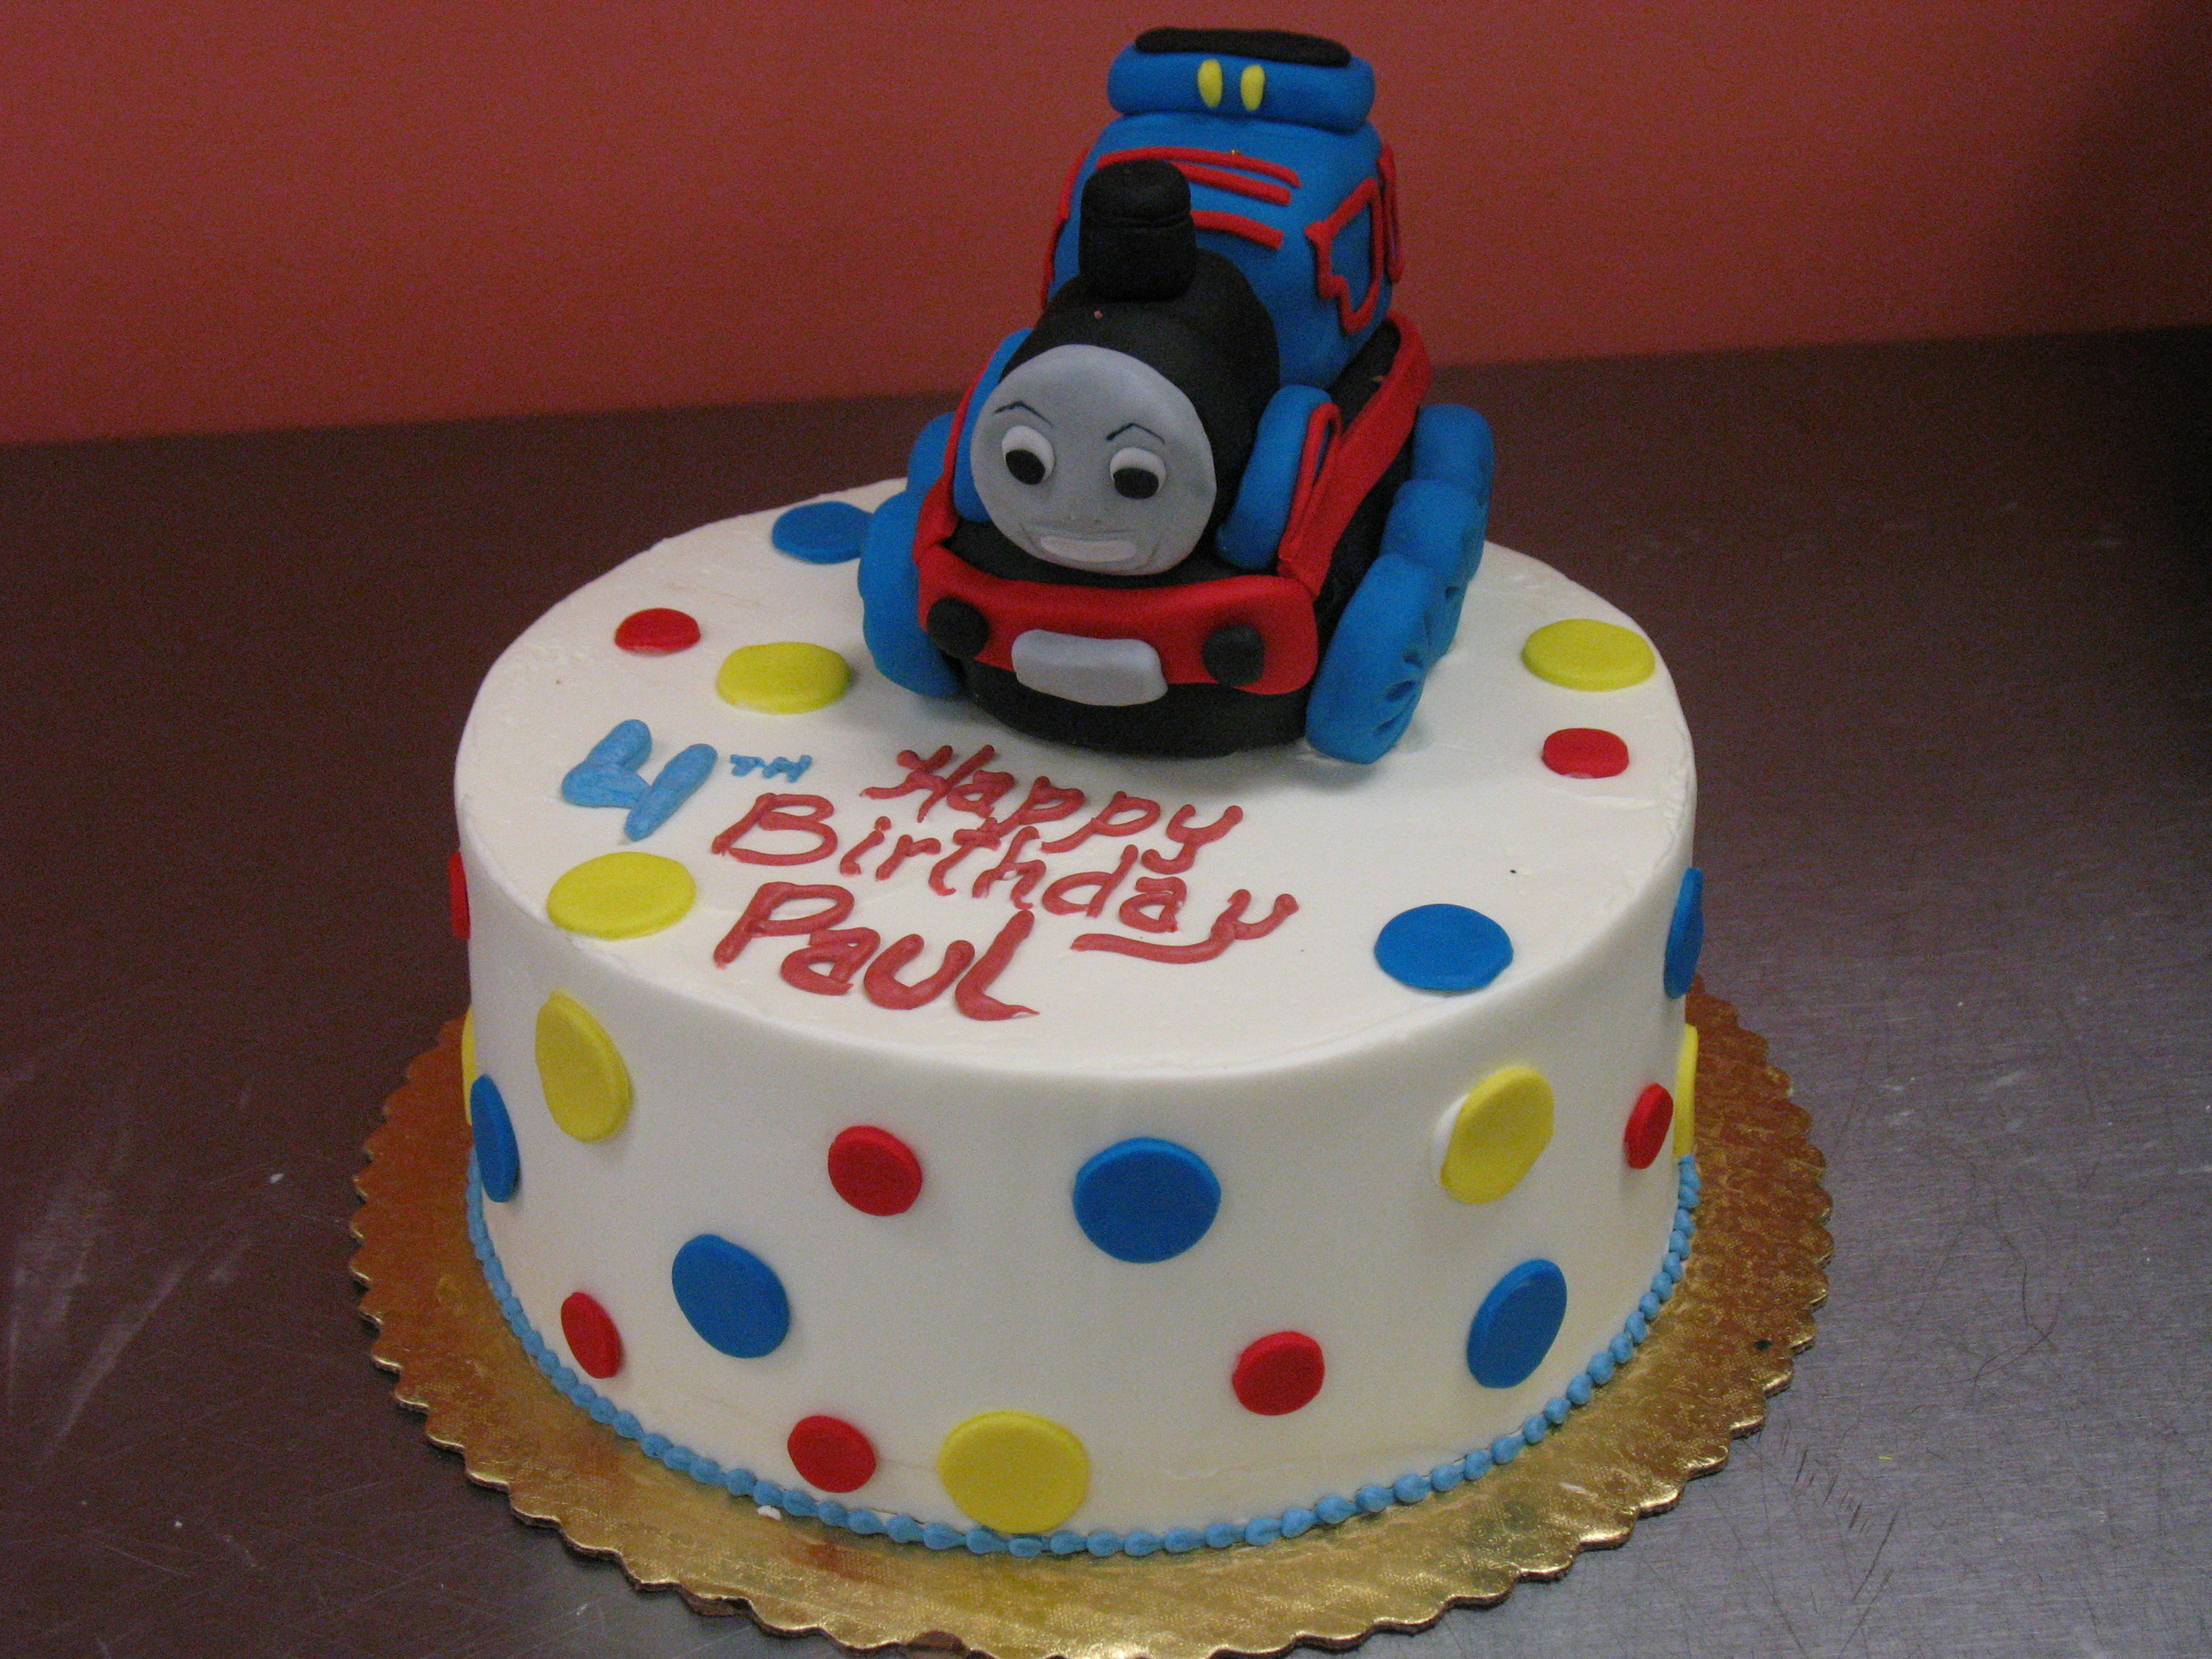 Mickey Mouse Birthday Cake IMG 1705JPG